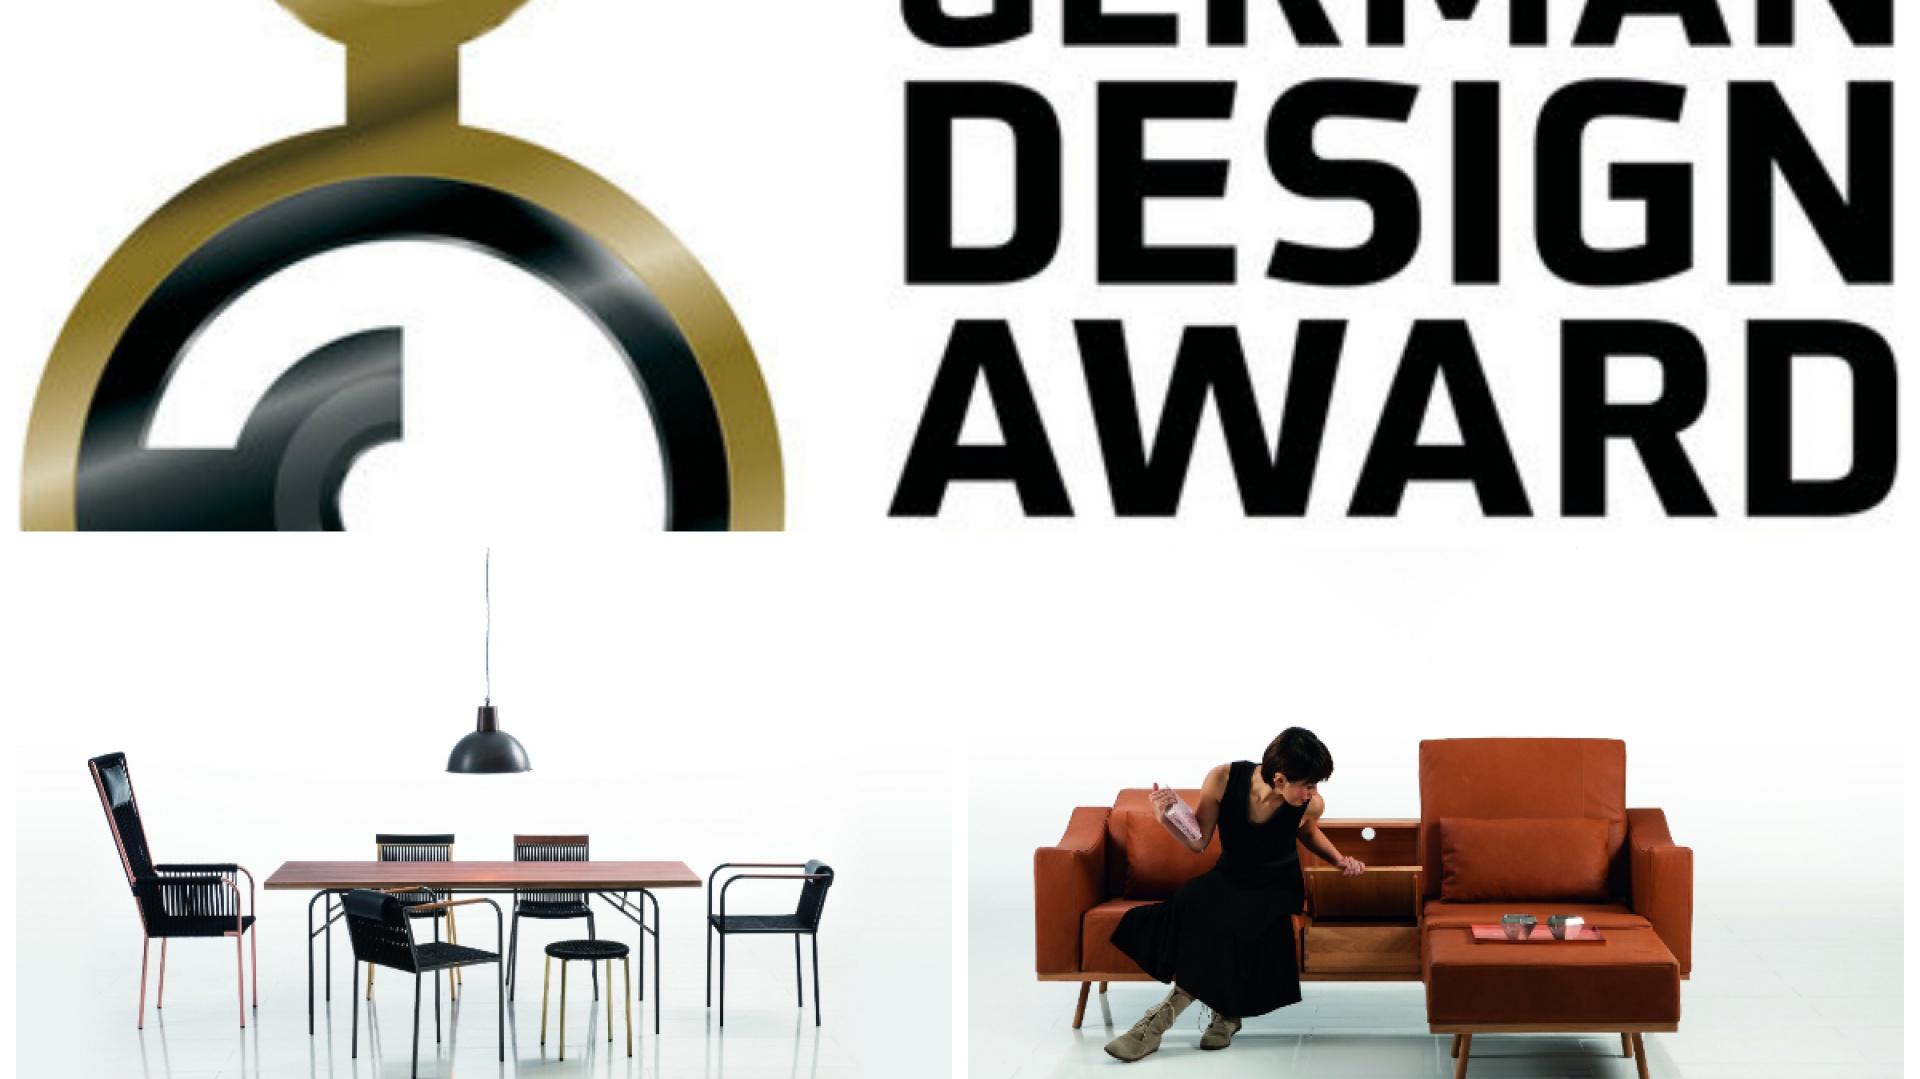 Kati Meyer-Brühl uhonorowana na German Design Award 2016. Fot. Materiały prasowe